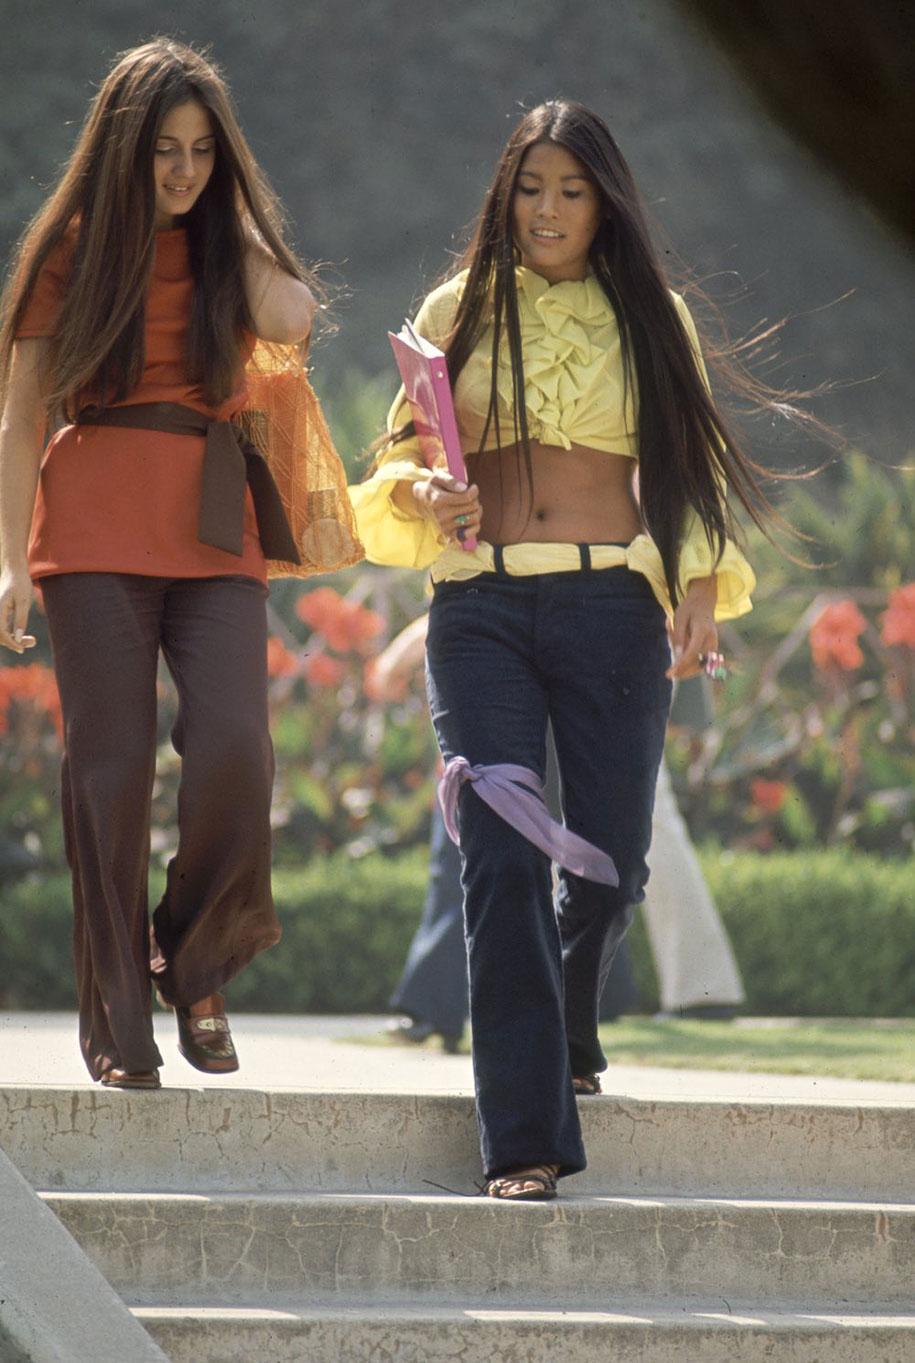 1969-hippie-high-school-counterculture-photography-9